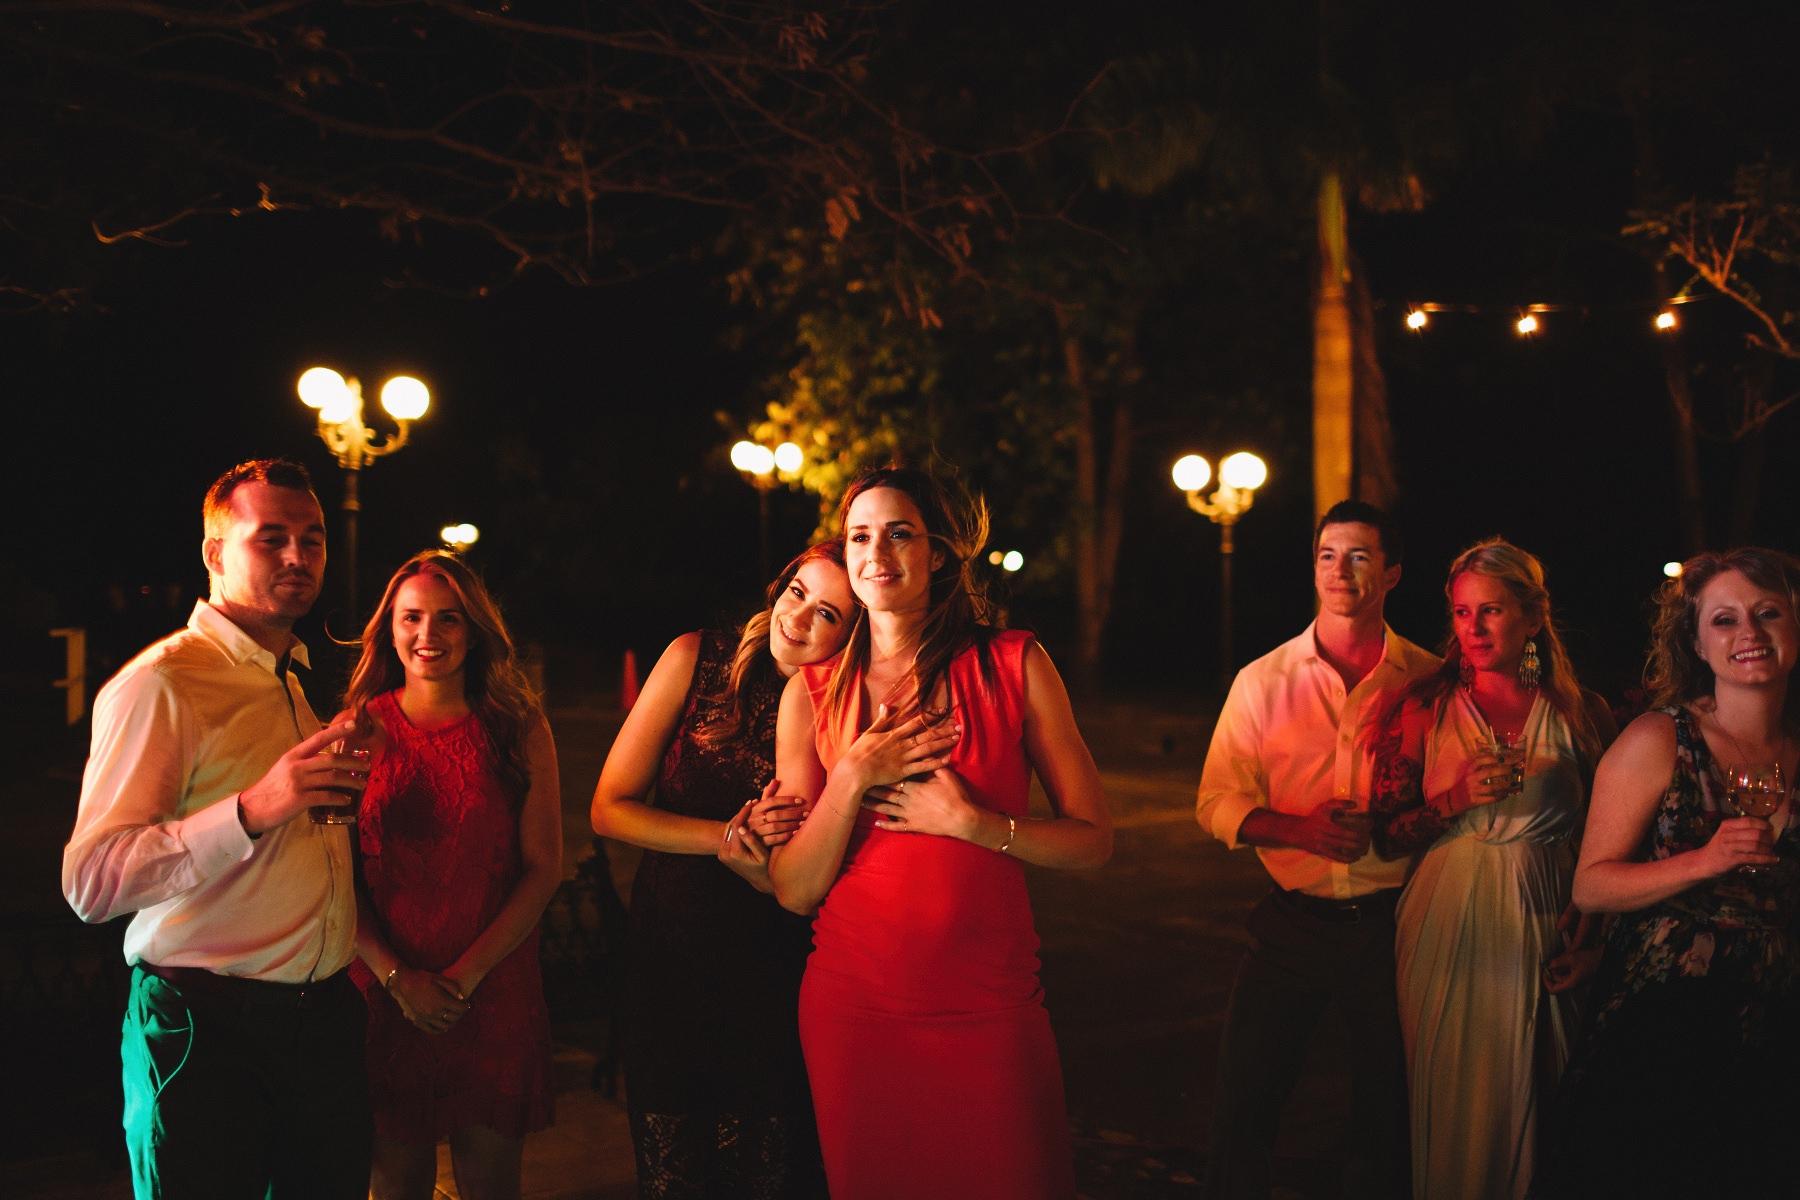 Colonial style destination wedding - Mexico, Nicaragua